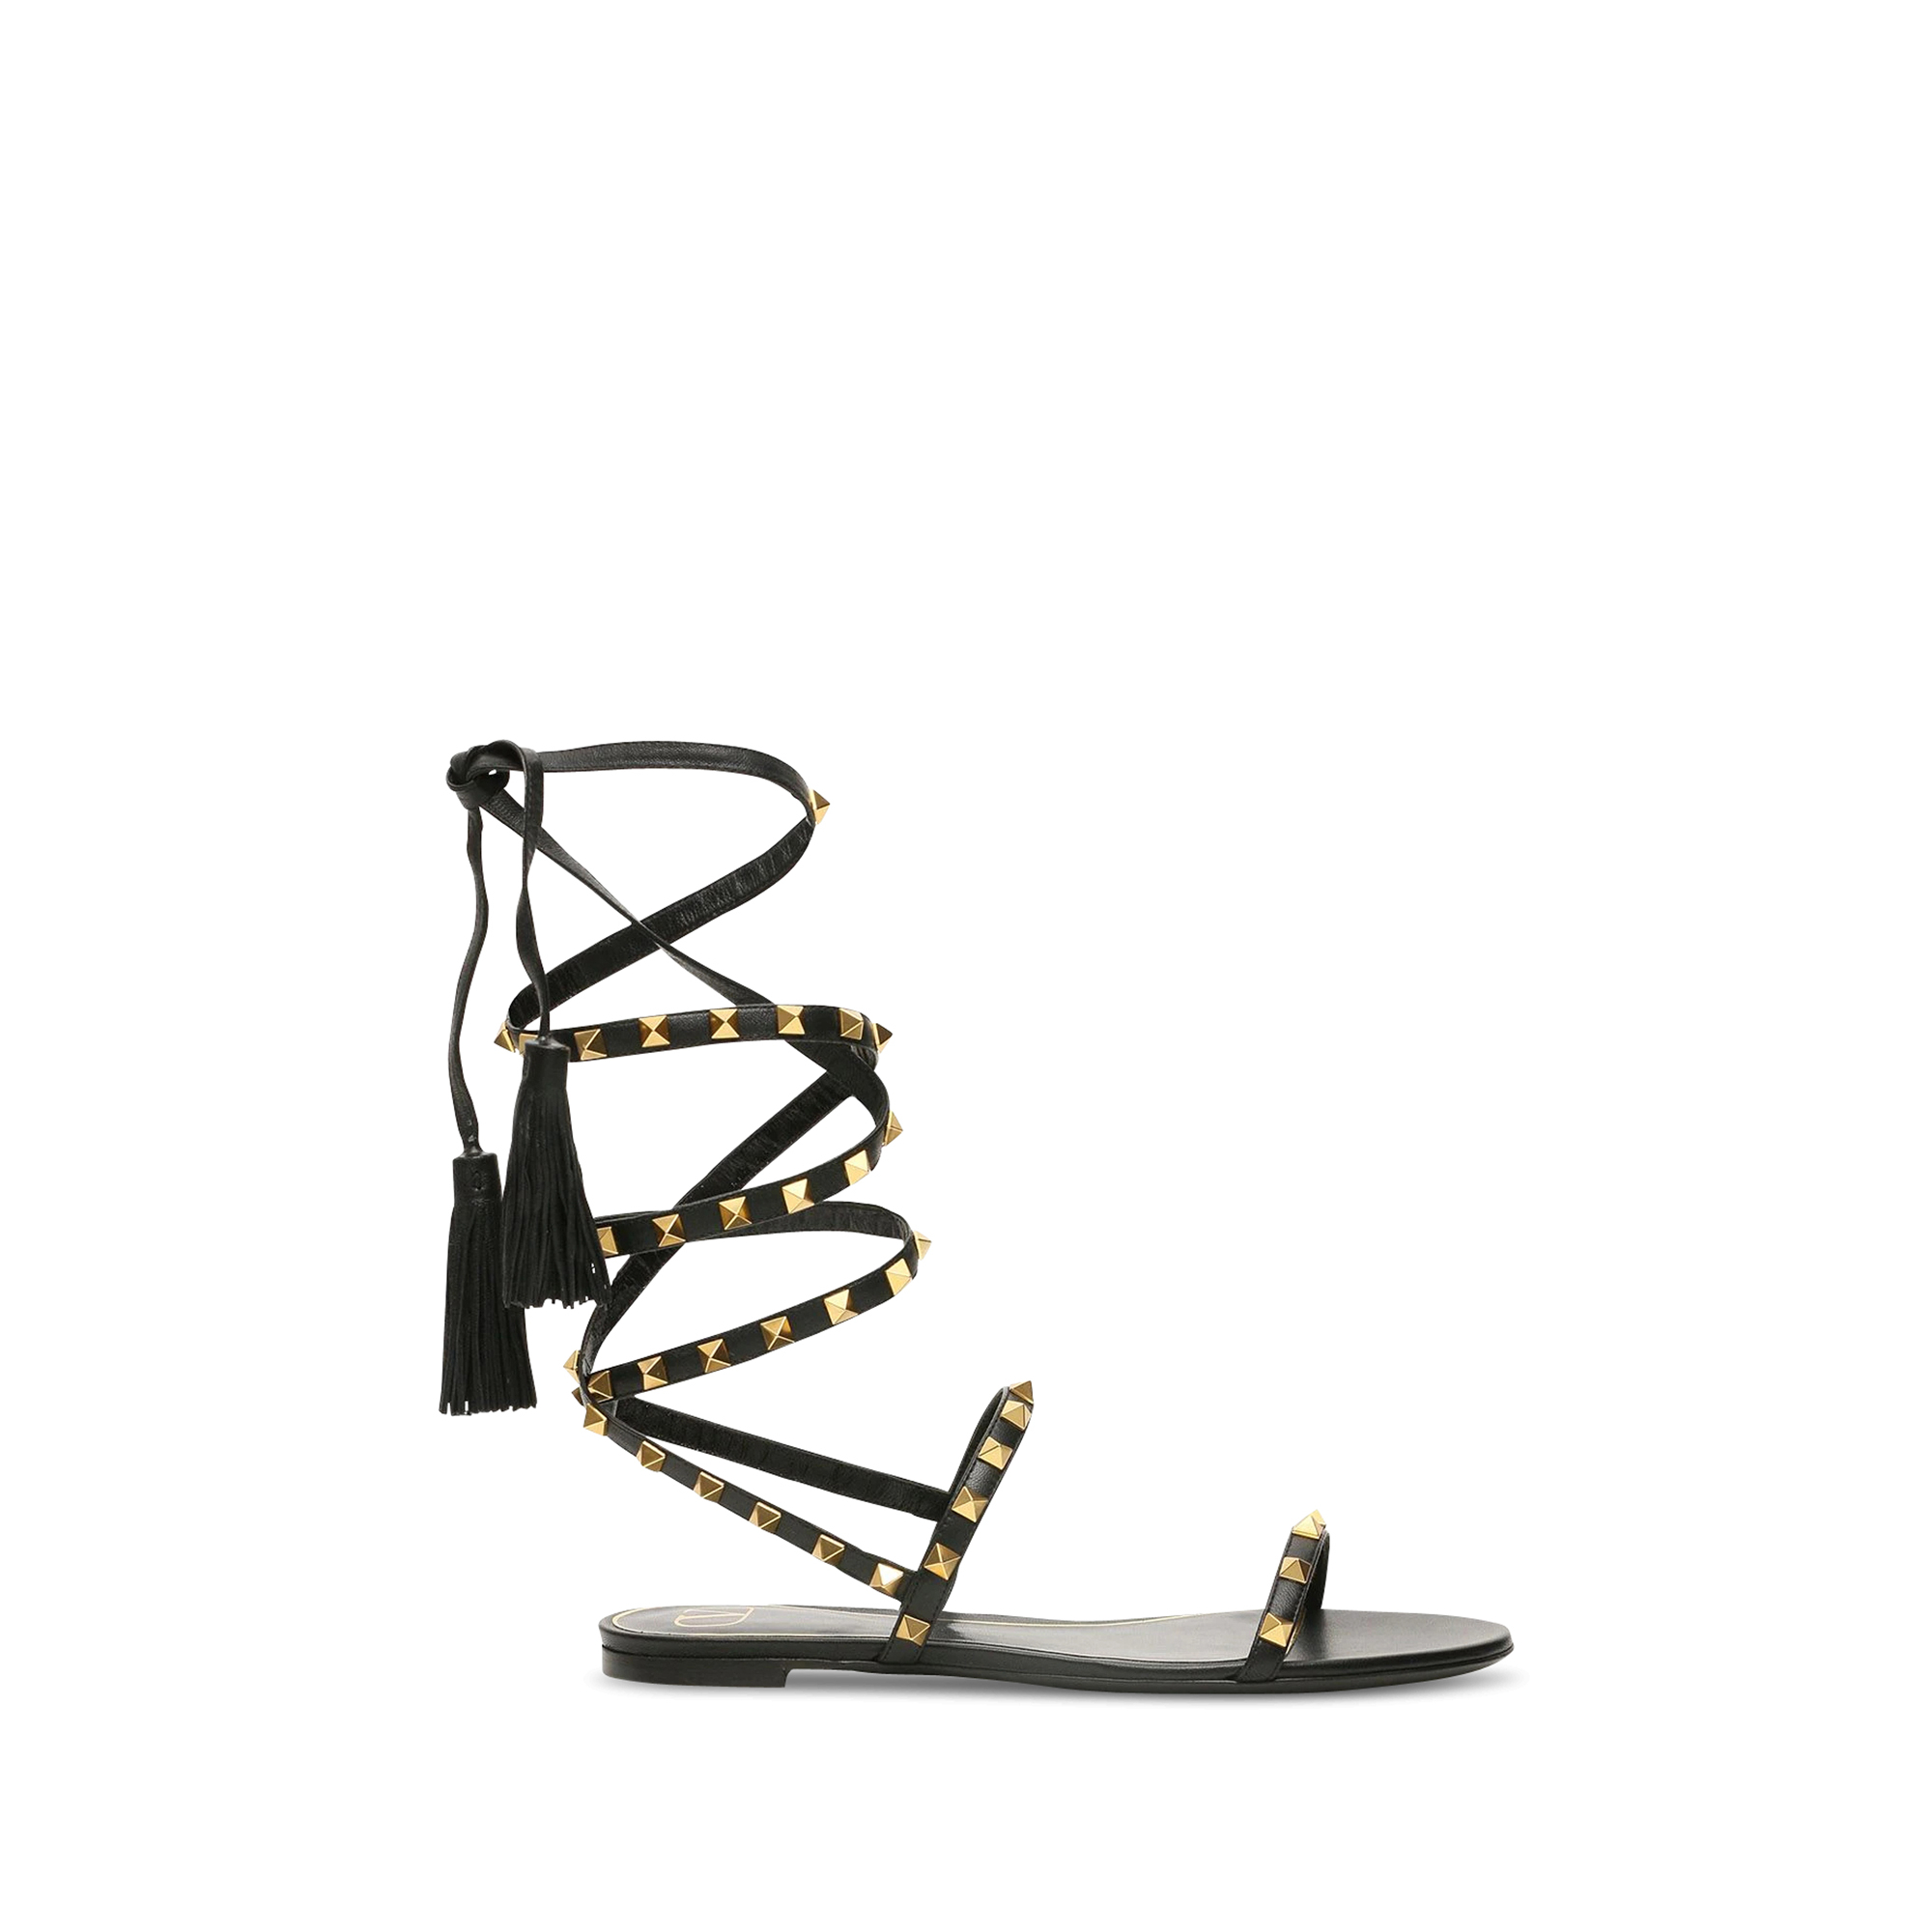 Valentino Garavani sandals in black leather.